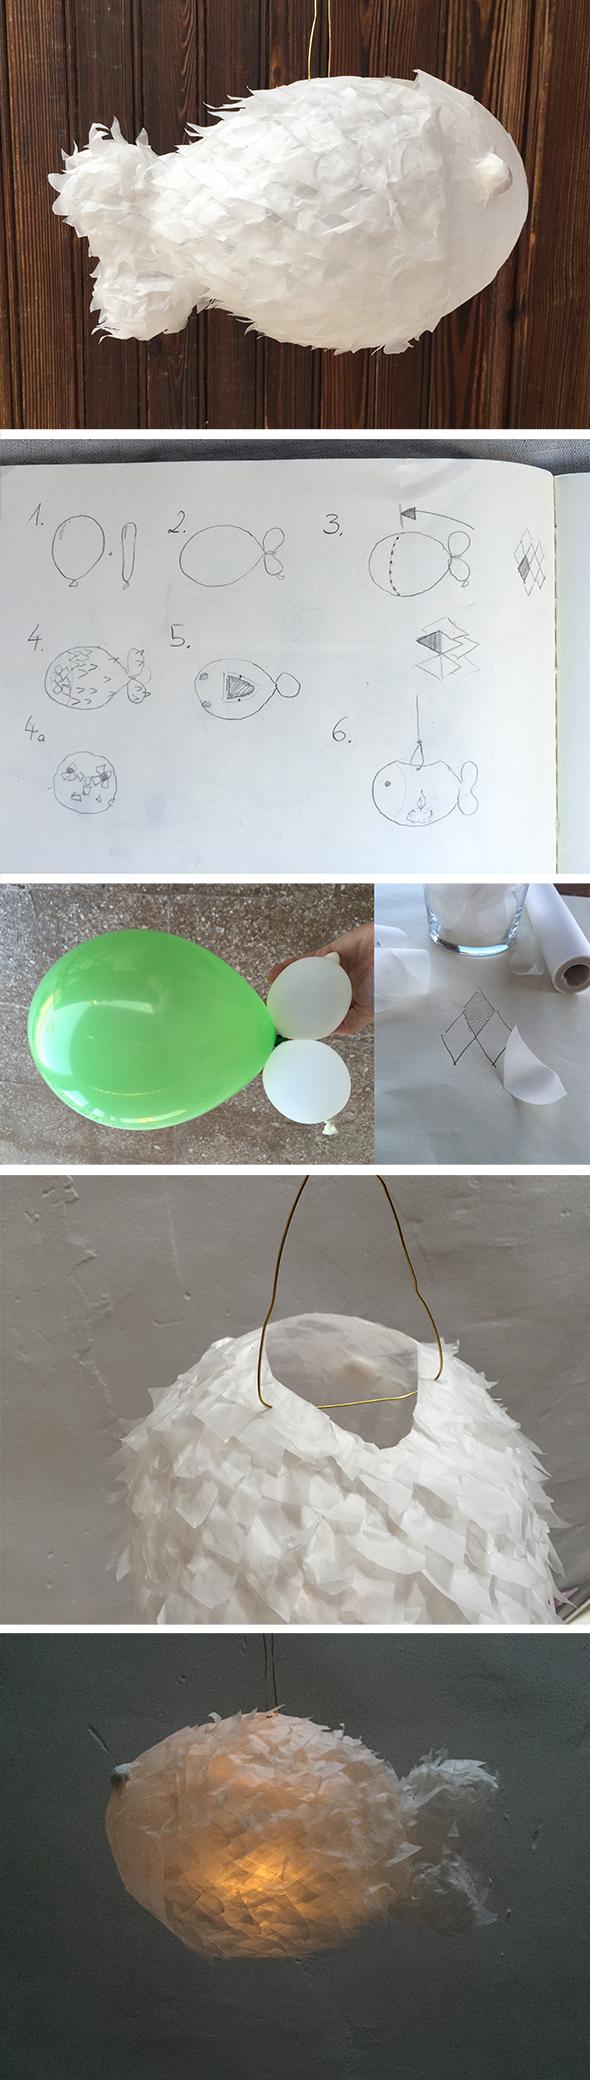 globo pez laterne luftballon fisch fish balloon kids craft easy kinder basteln manualidad ninos faroleta